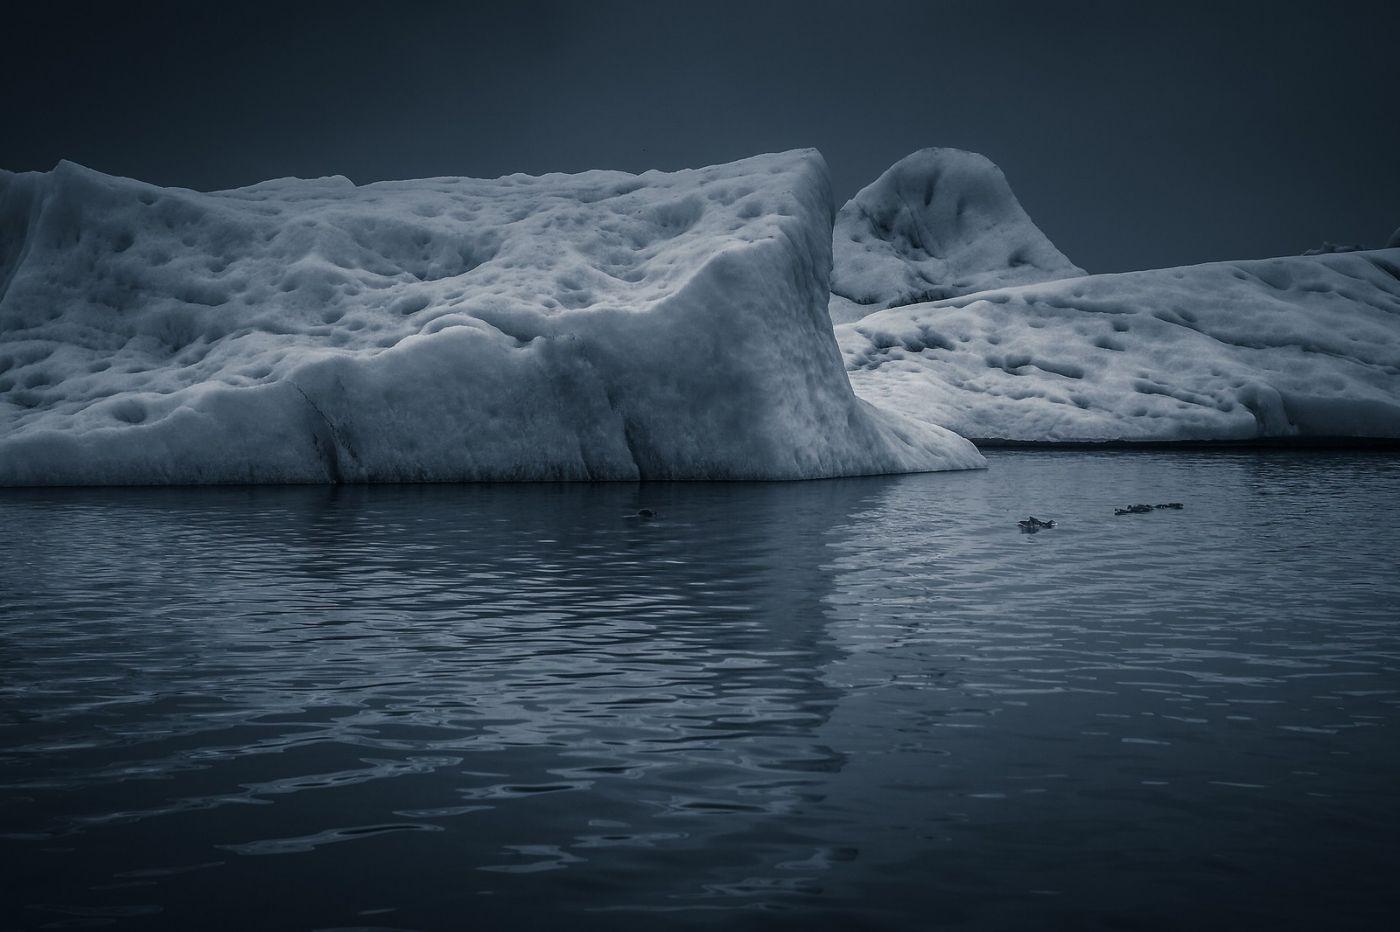 冰岛冰川泻湖(Glacier Lagoon),流动的冰川_图1-4